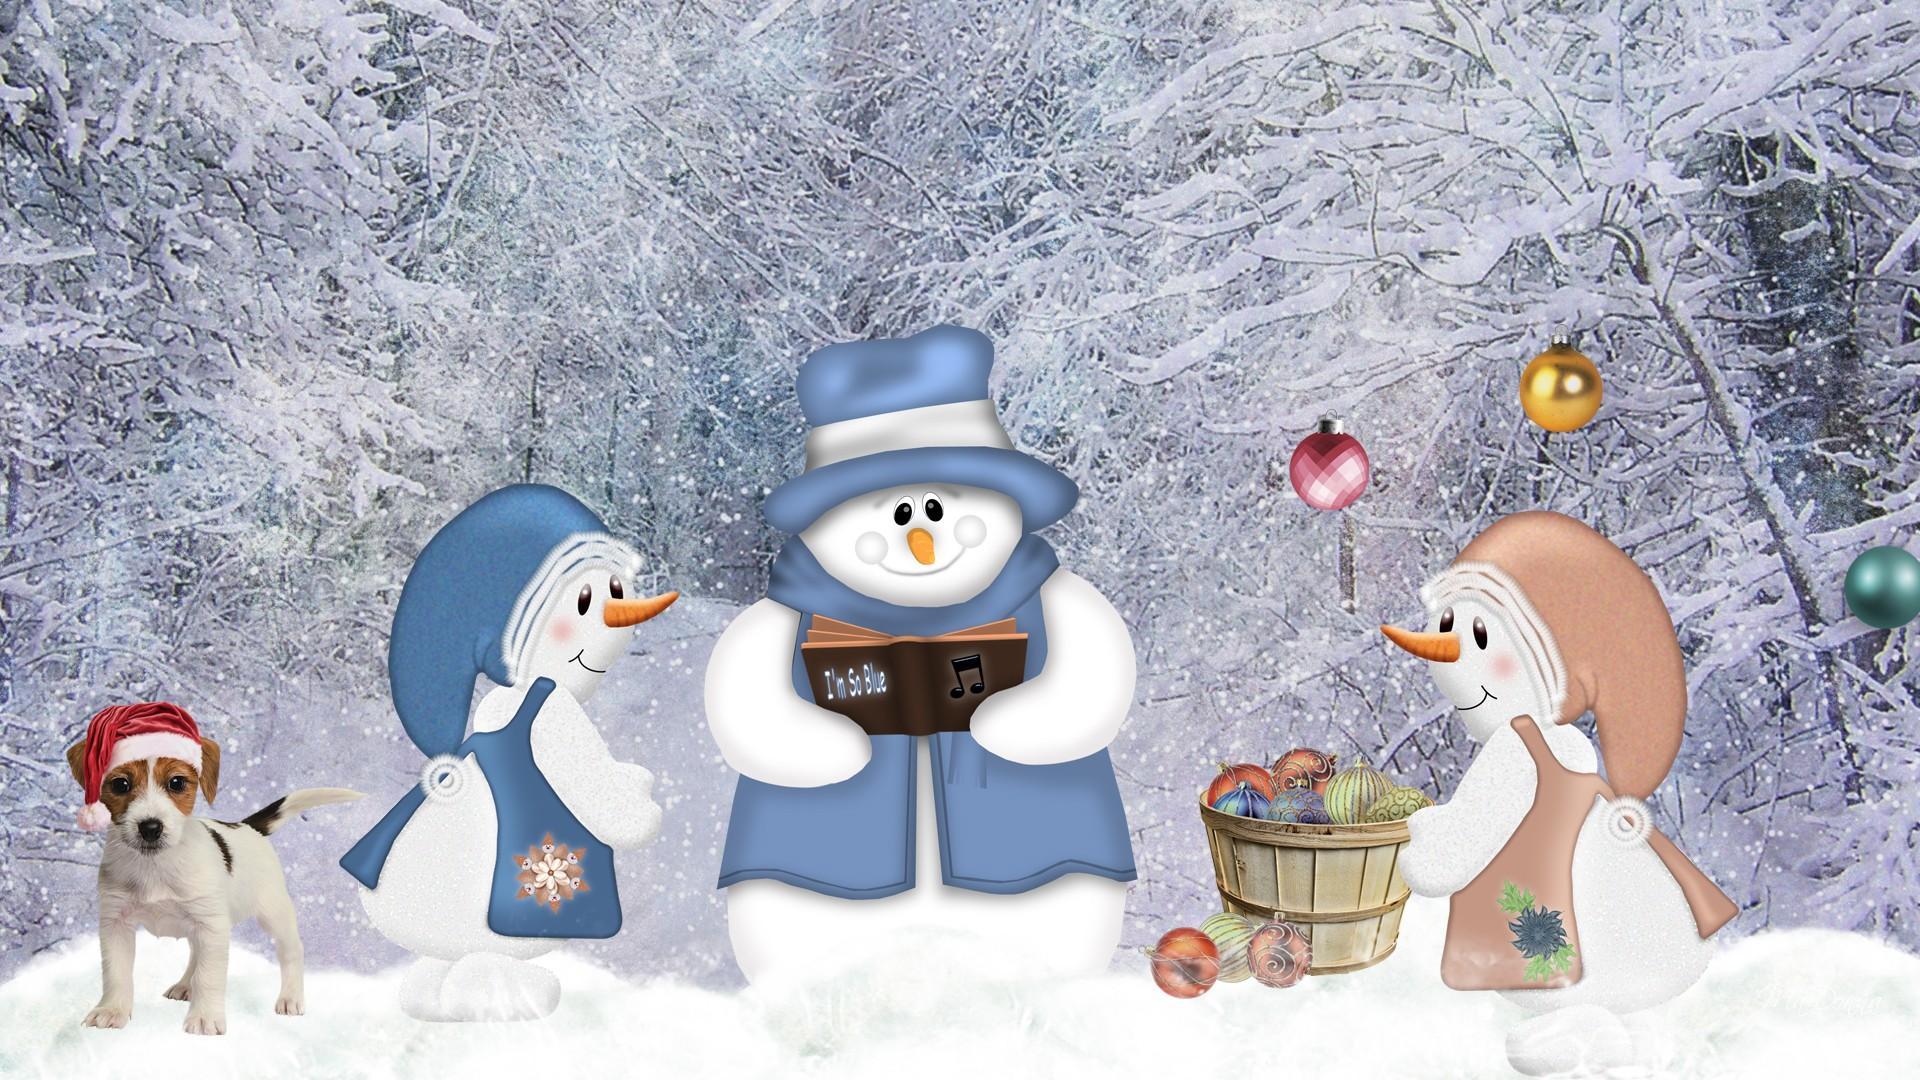 Free Fall Desktop Wallpaper For Mac Snowman Wallpapers Free Download Pixelstalk Net